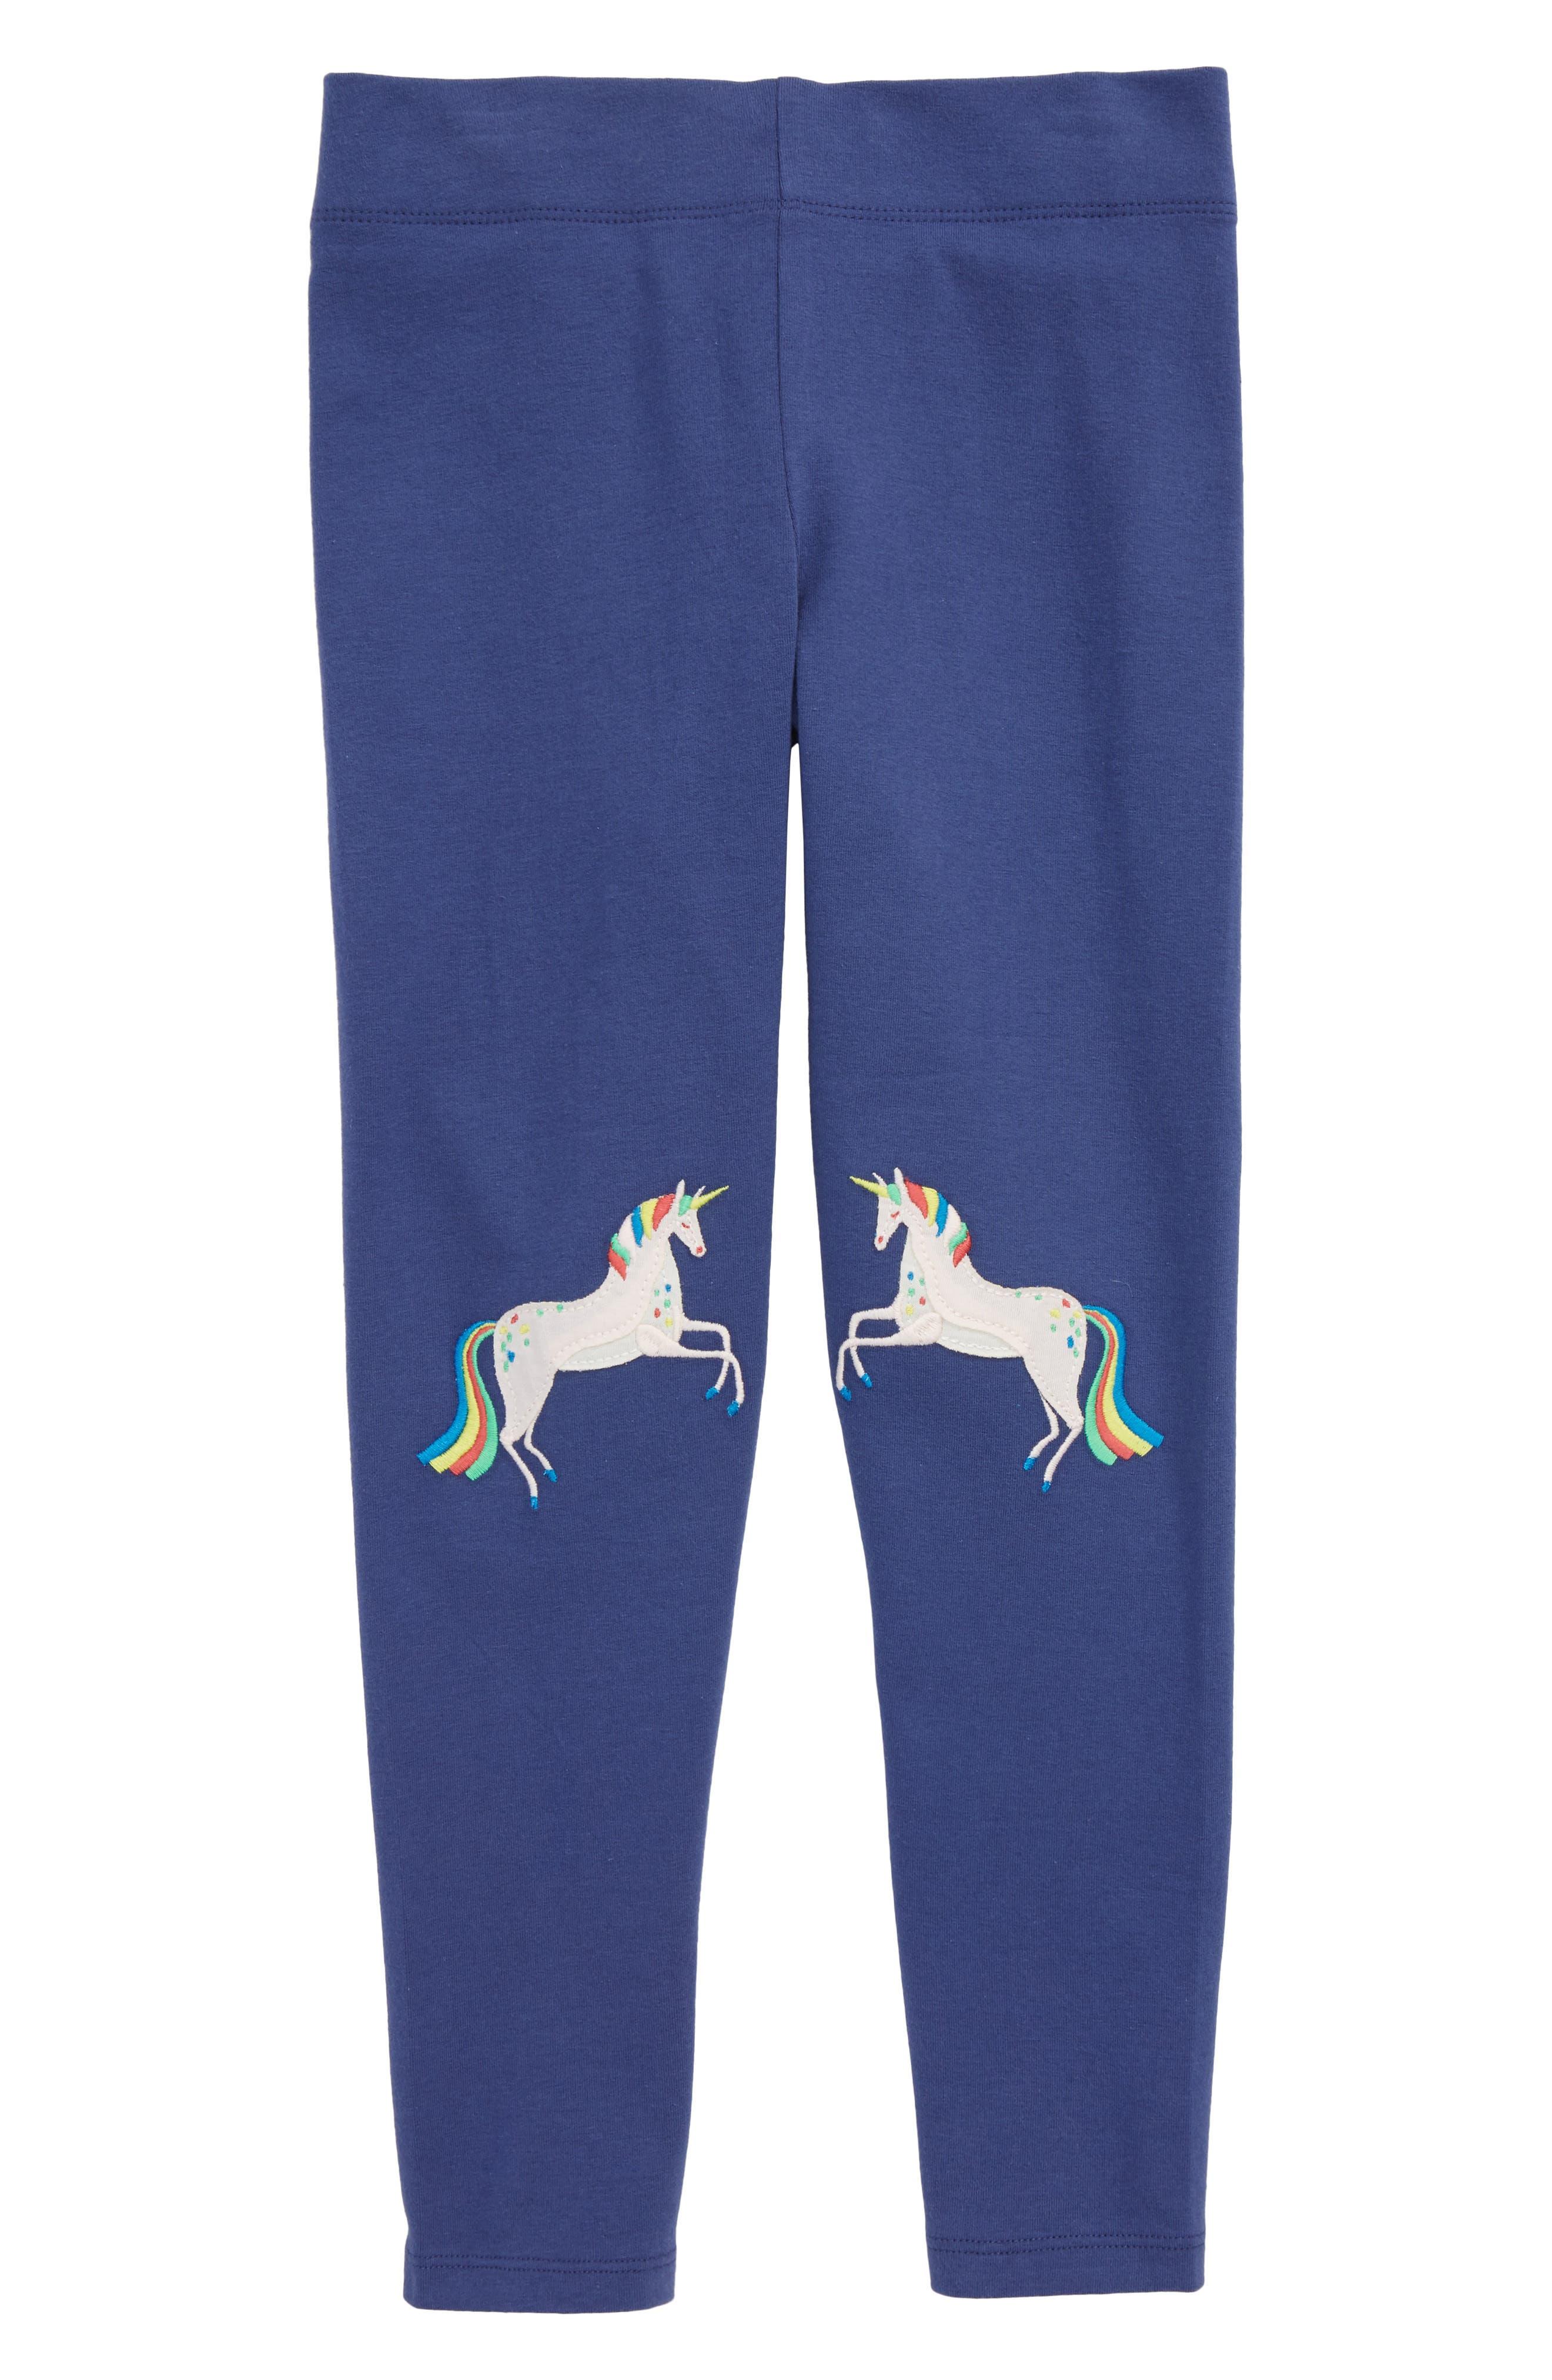 Appliqué Leggings,                         Main,                         color, Navstarboard Blue Unicorns